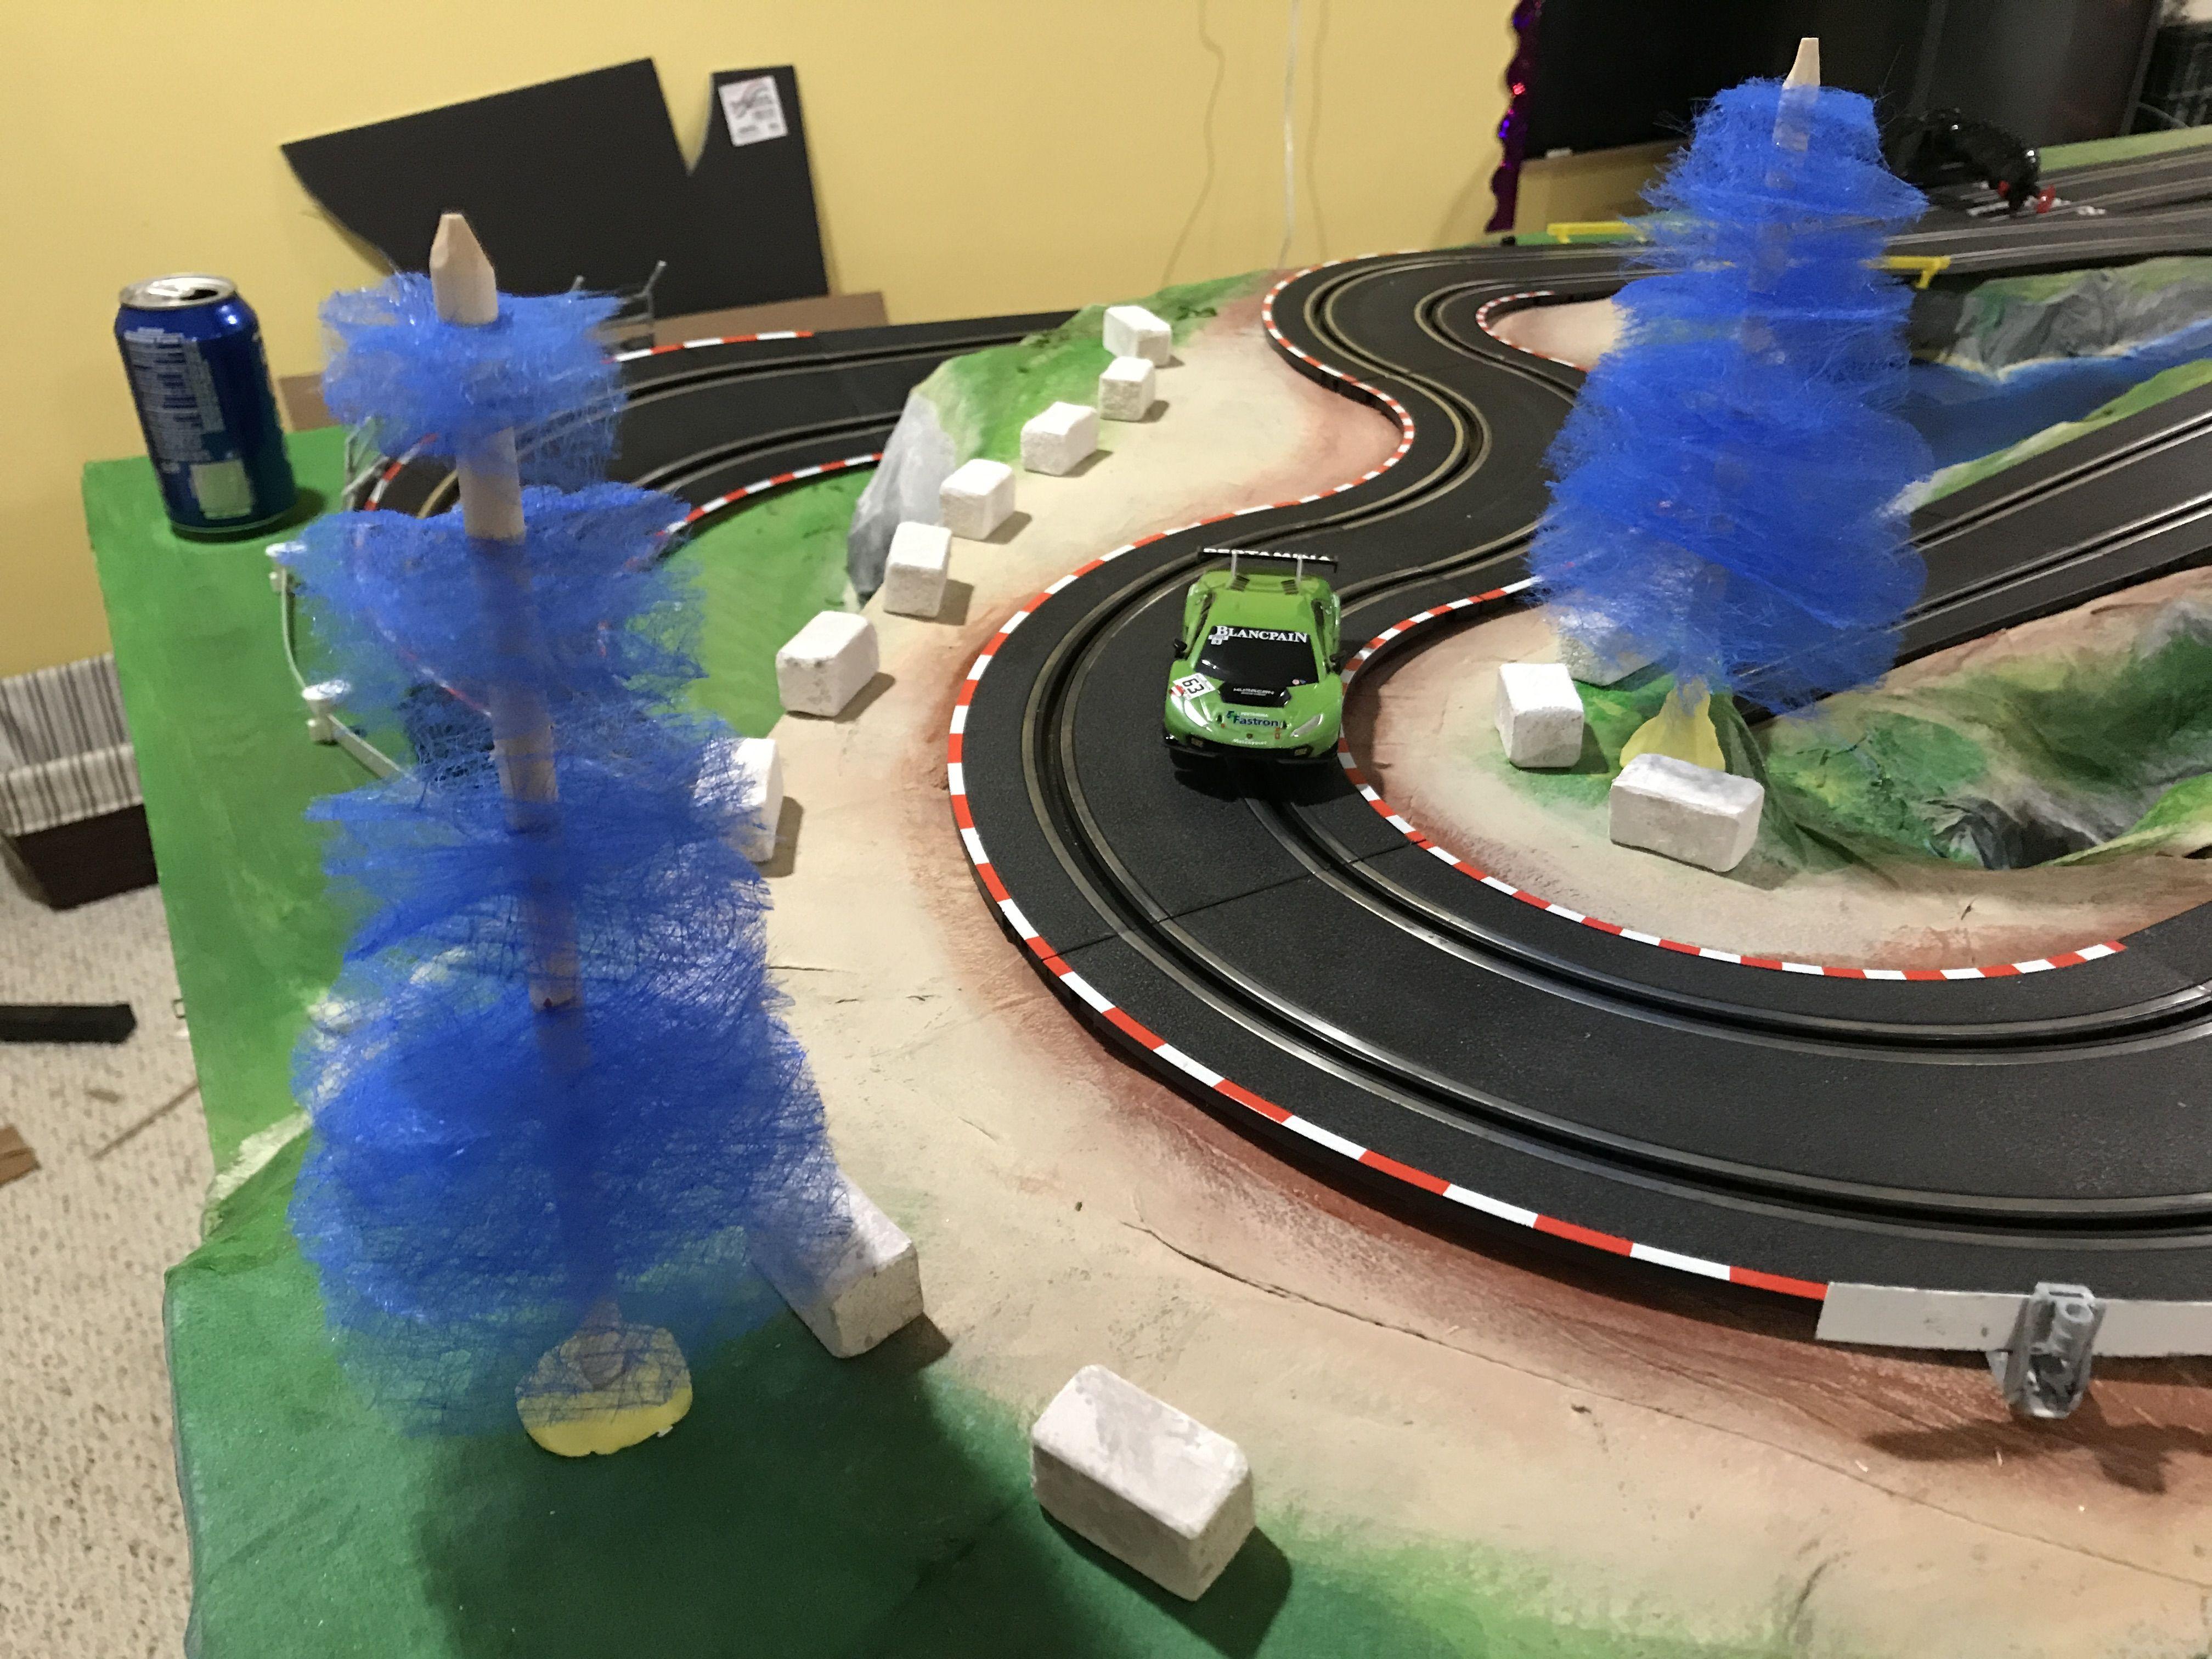 Carrera Go 1/43 slot car track WIP. Trees inprogress